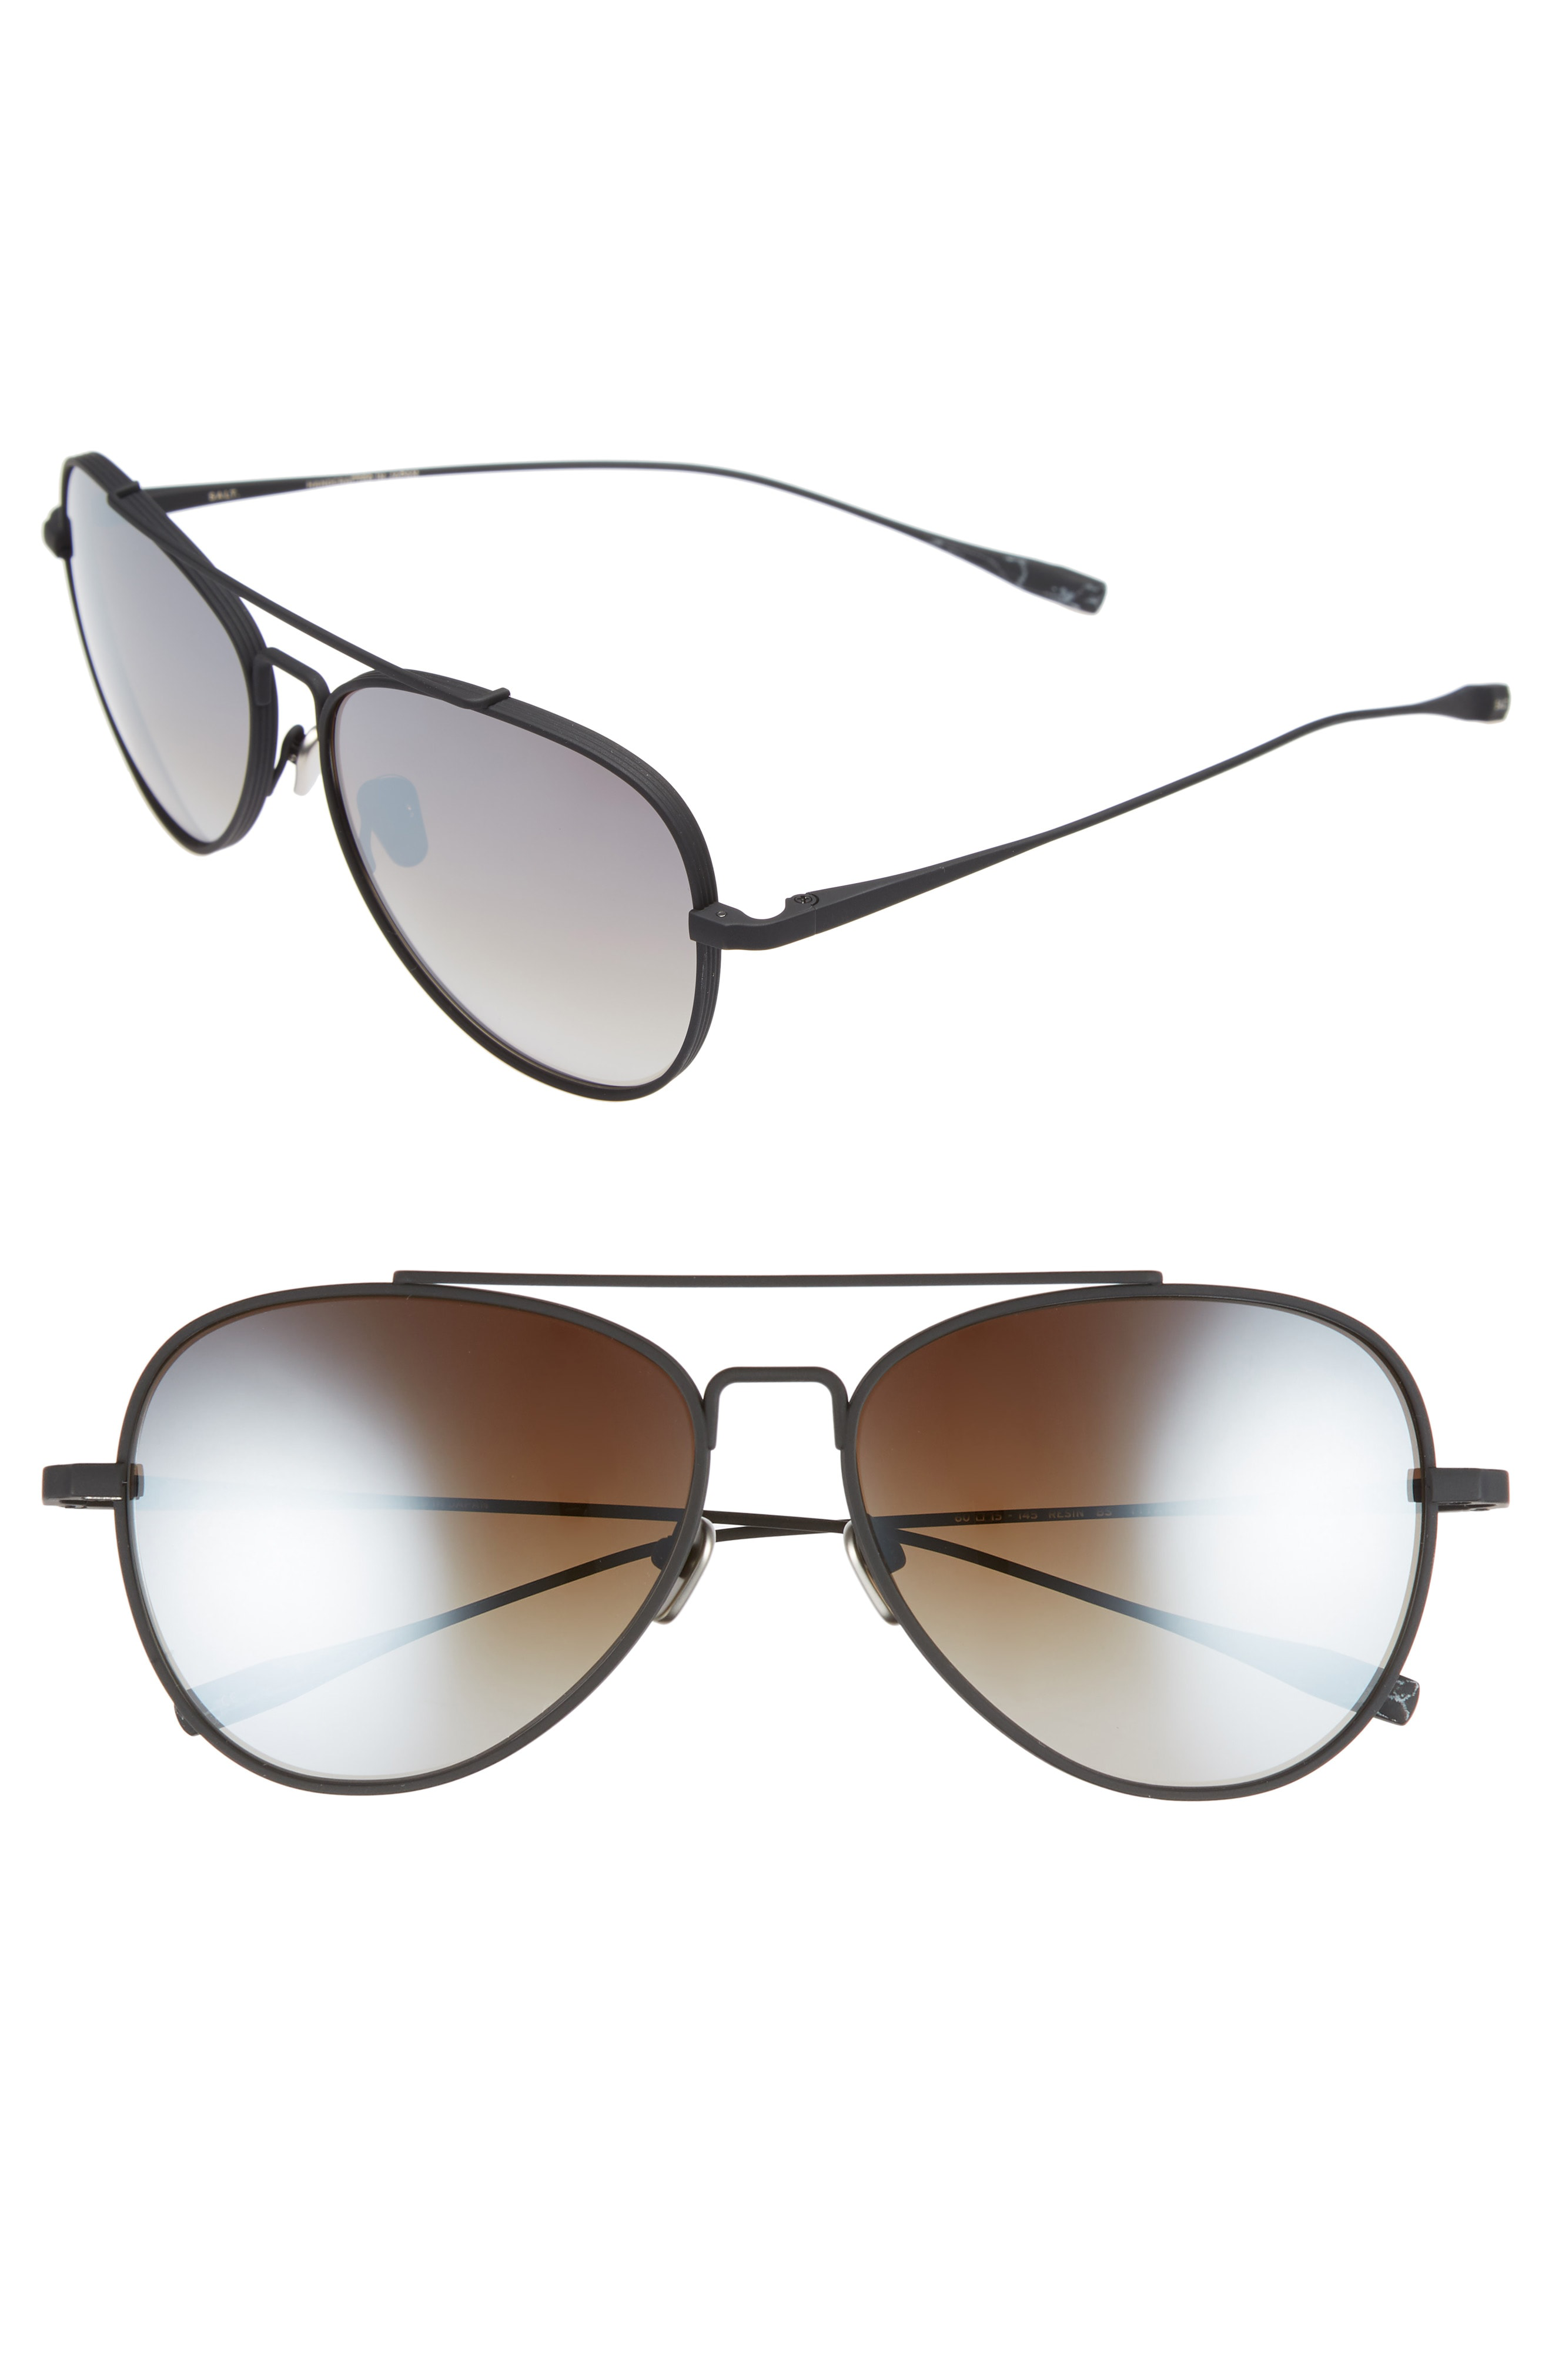 ff426b74b0 Salt. 60Mm Polarized Aviator Sunglasses - Black